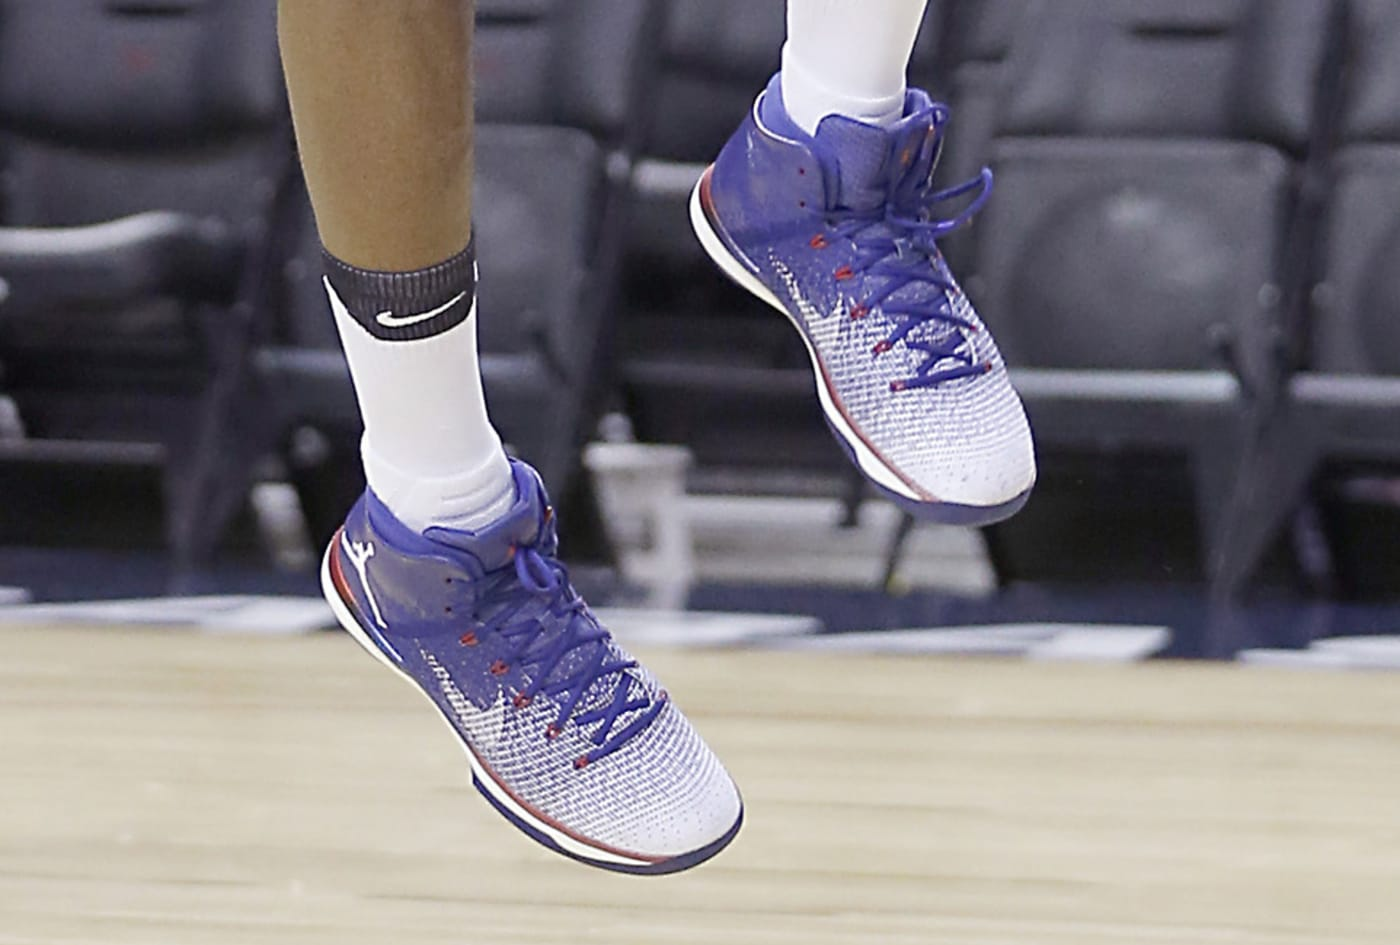 Jimmy Butler Debuts New Jordans at Practice